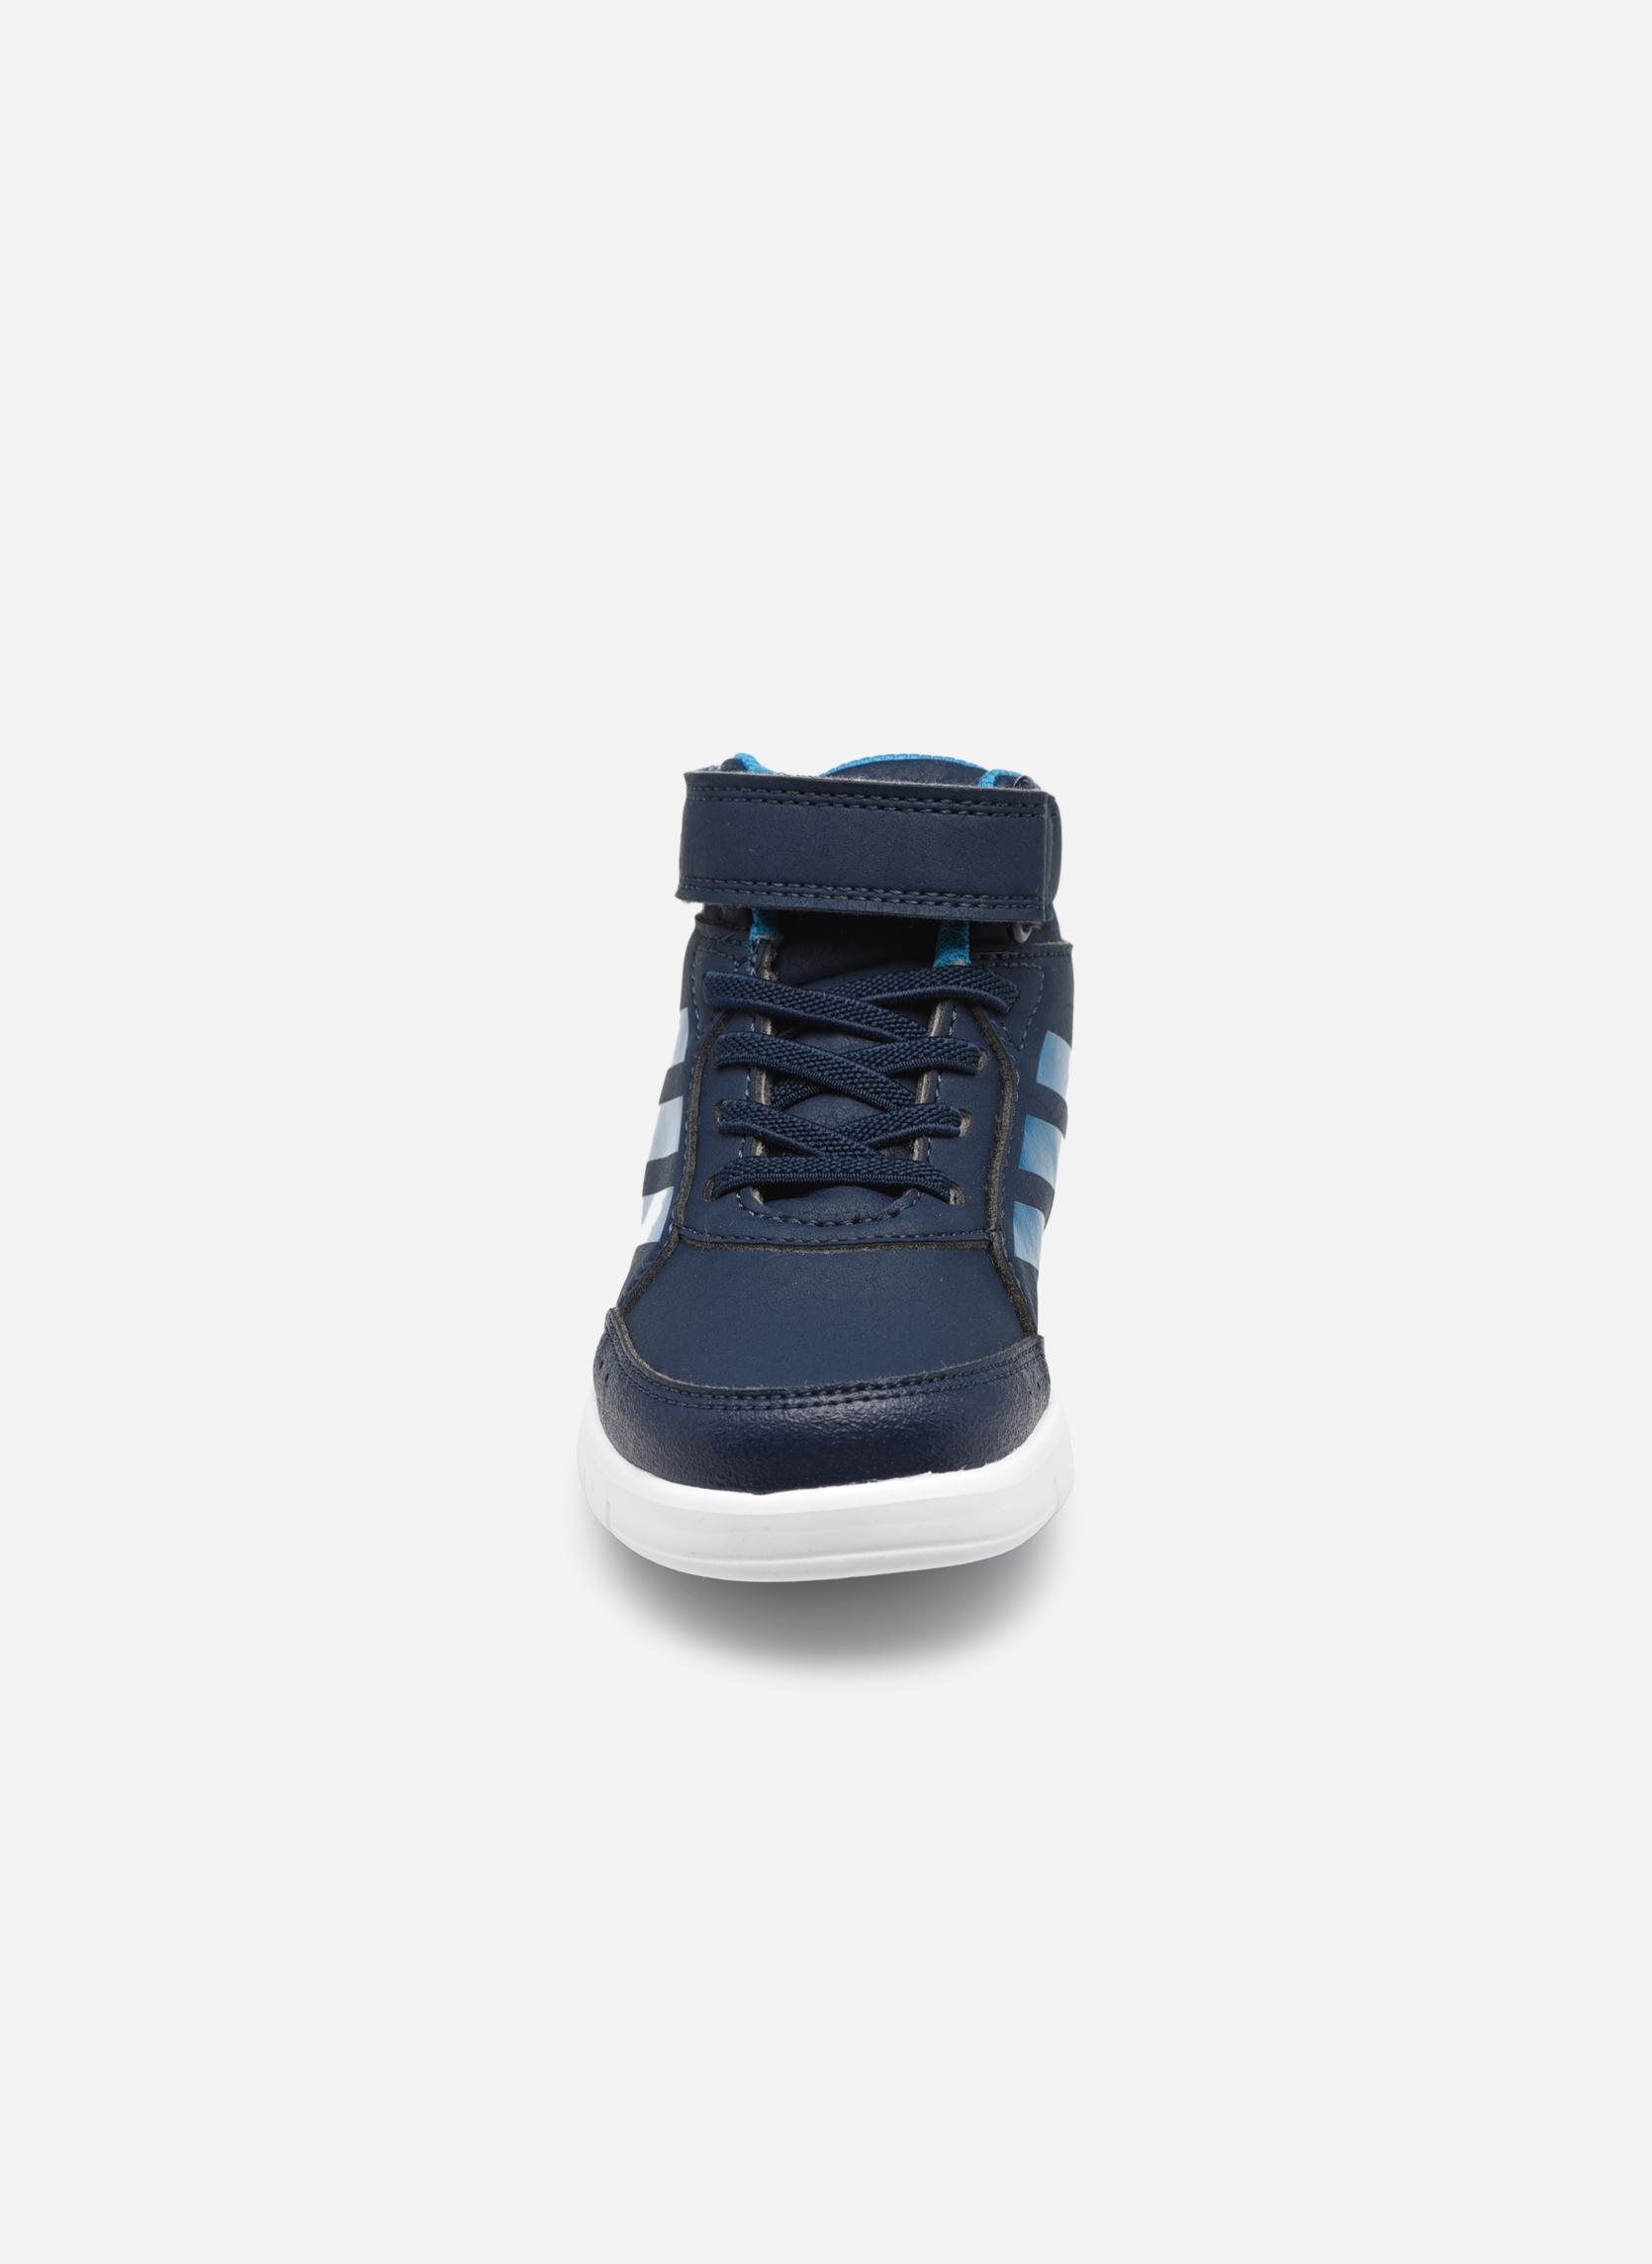 Encnob/Vinume/Supros Adidas Performance Altasport Mid El I (Violet)